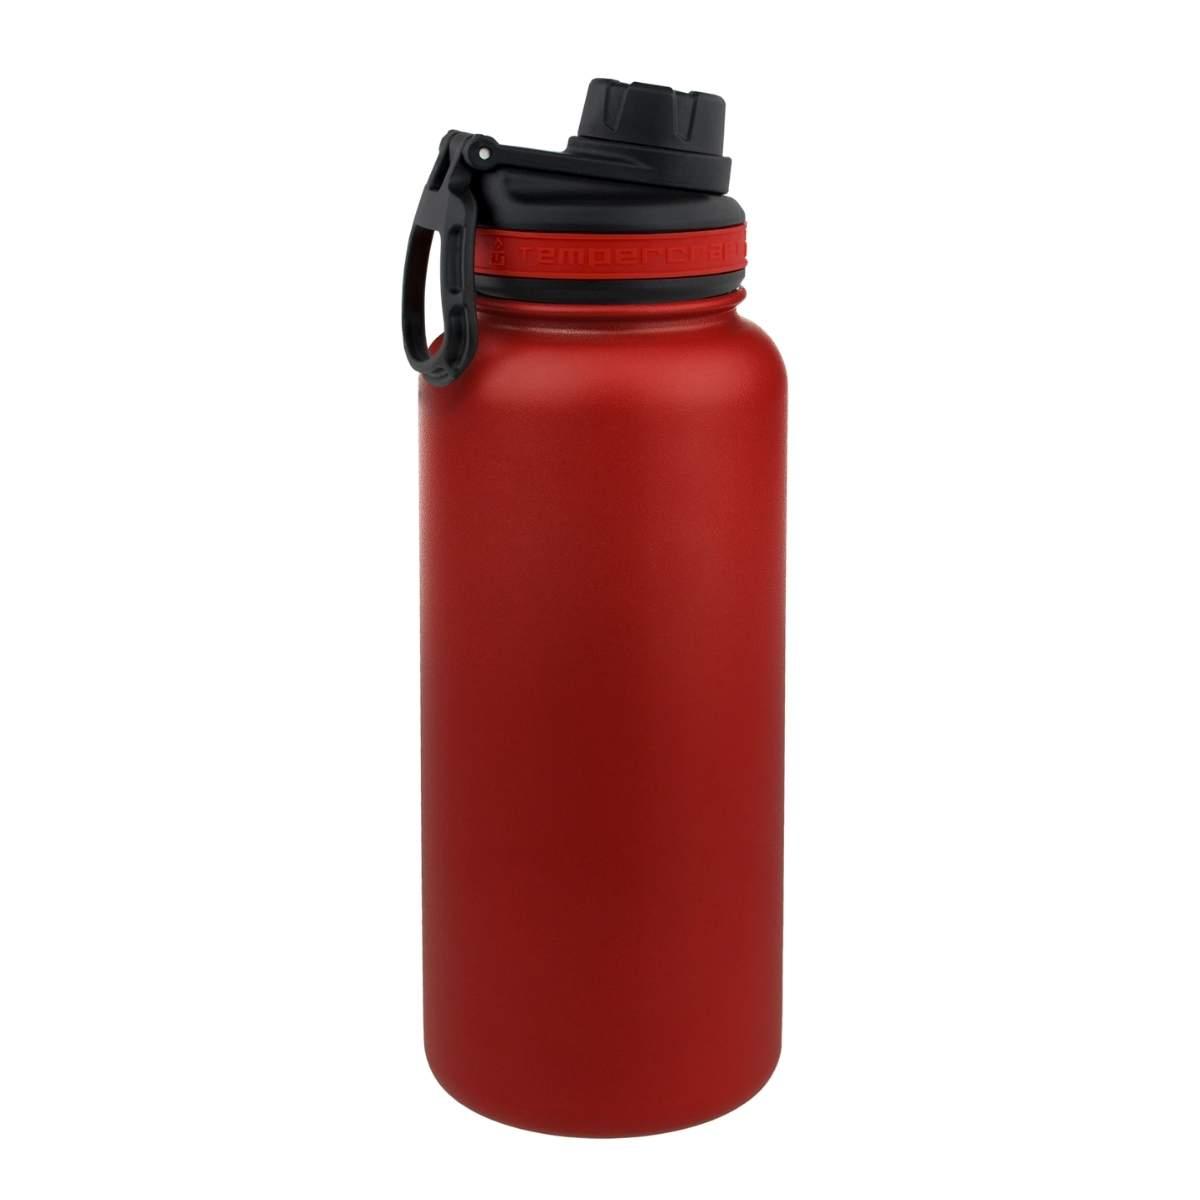 Tempercraft 32 oz. Water Bottle